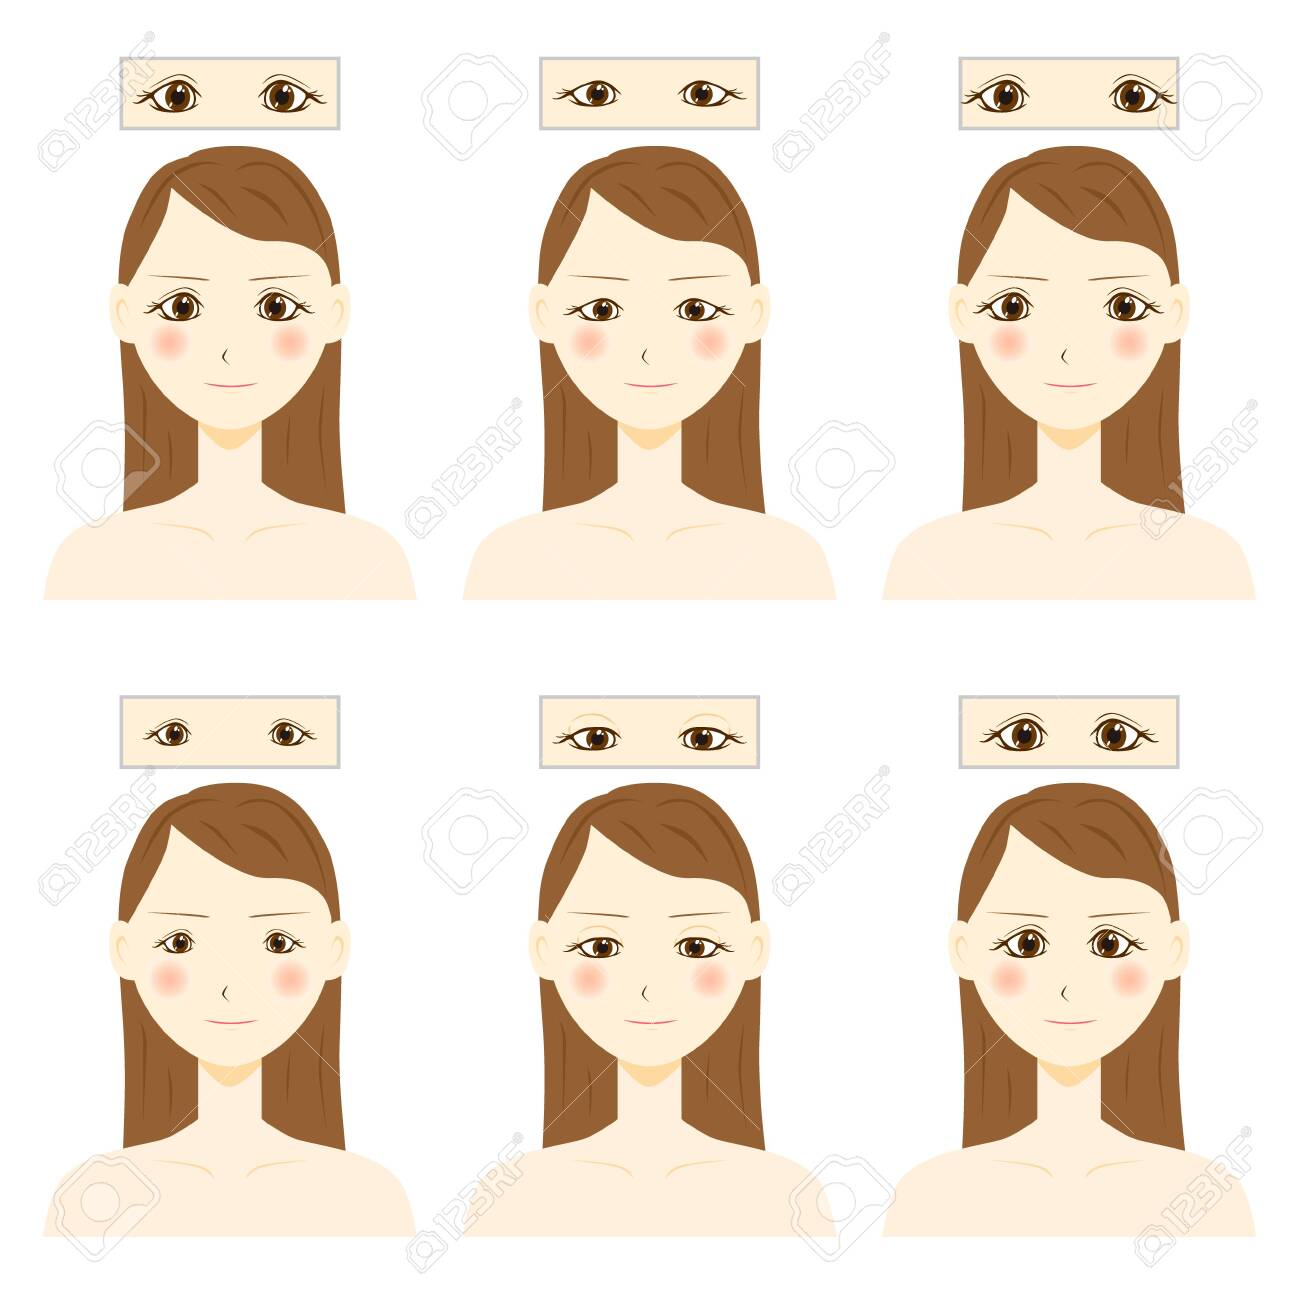 Eye shapes and types. Various female eye shapes. - 153511971